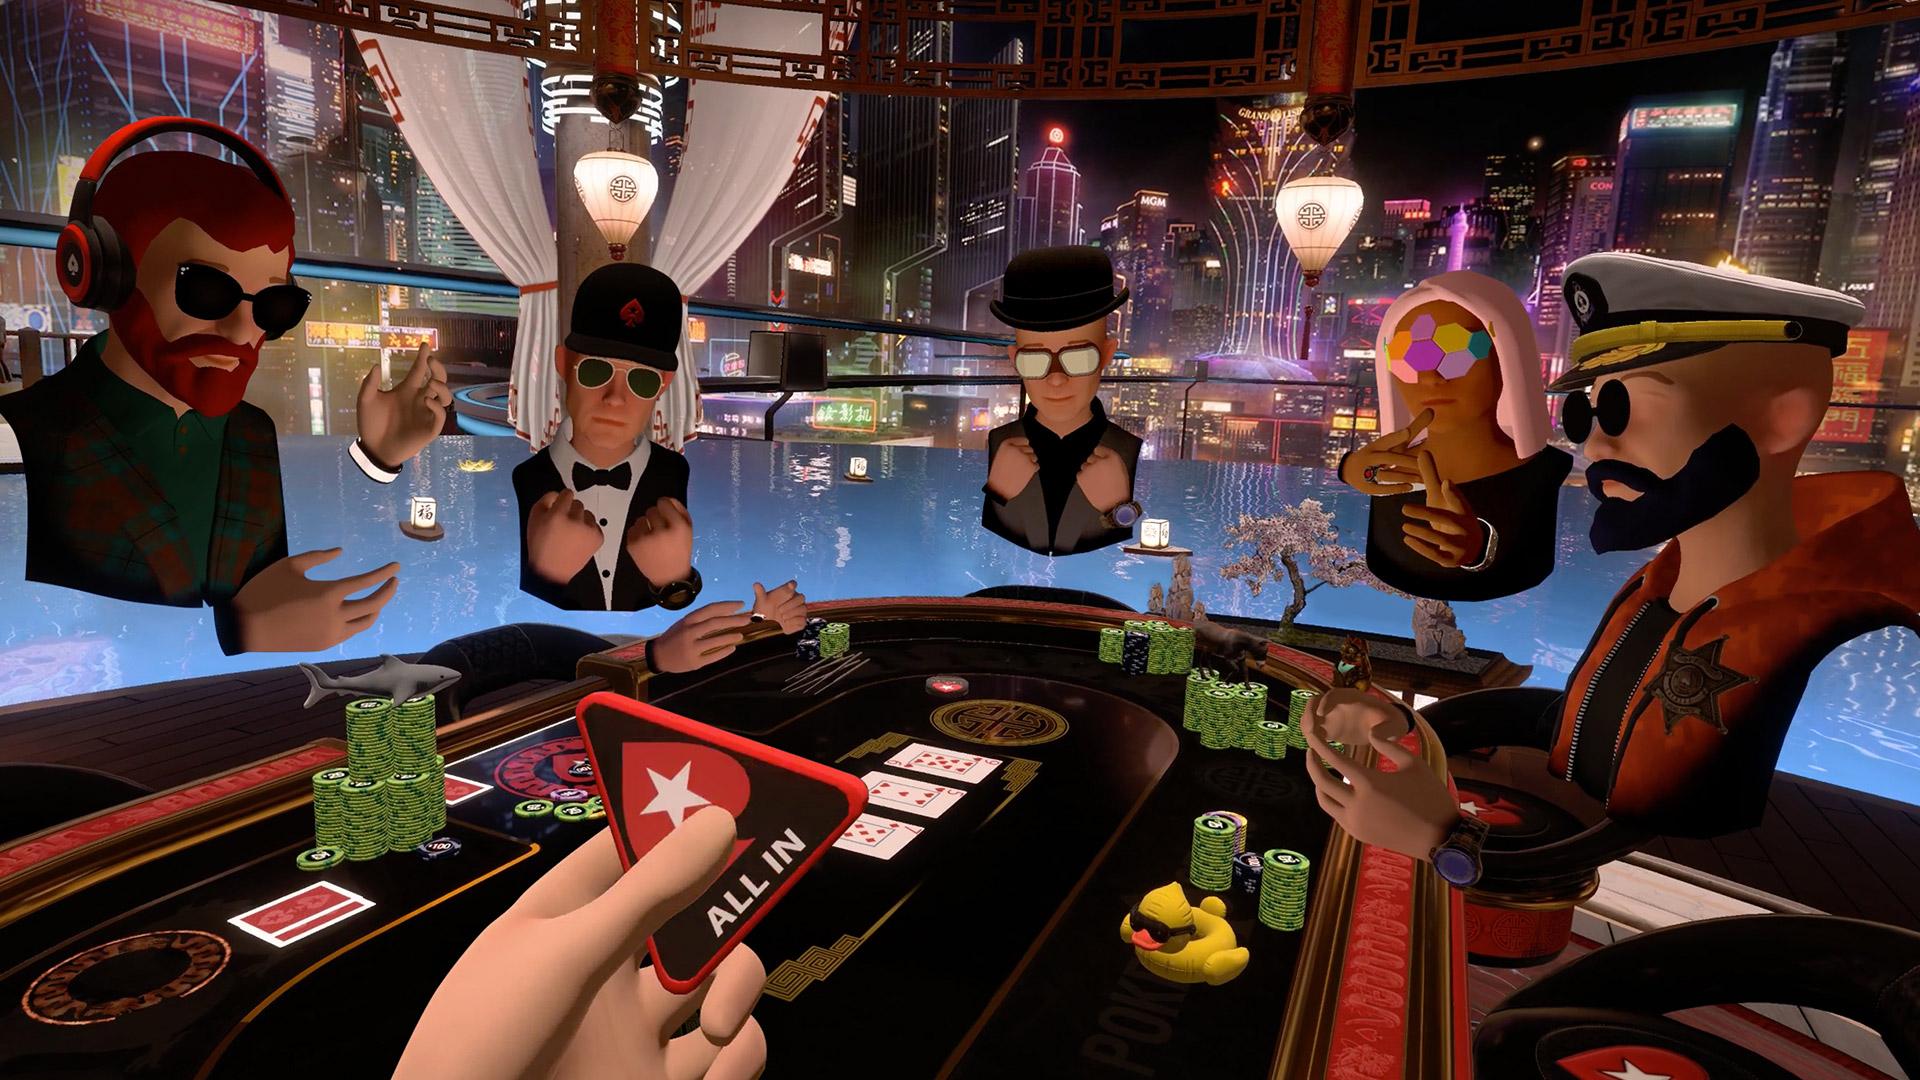 PokerStars VR on Steam